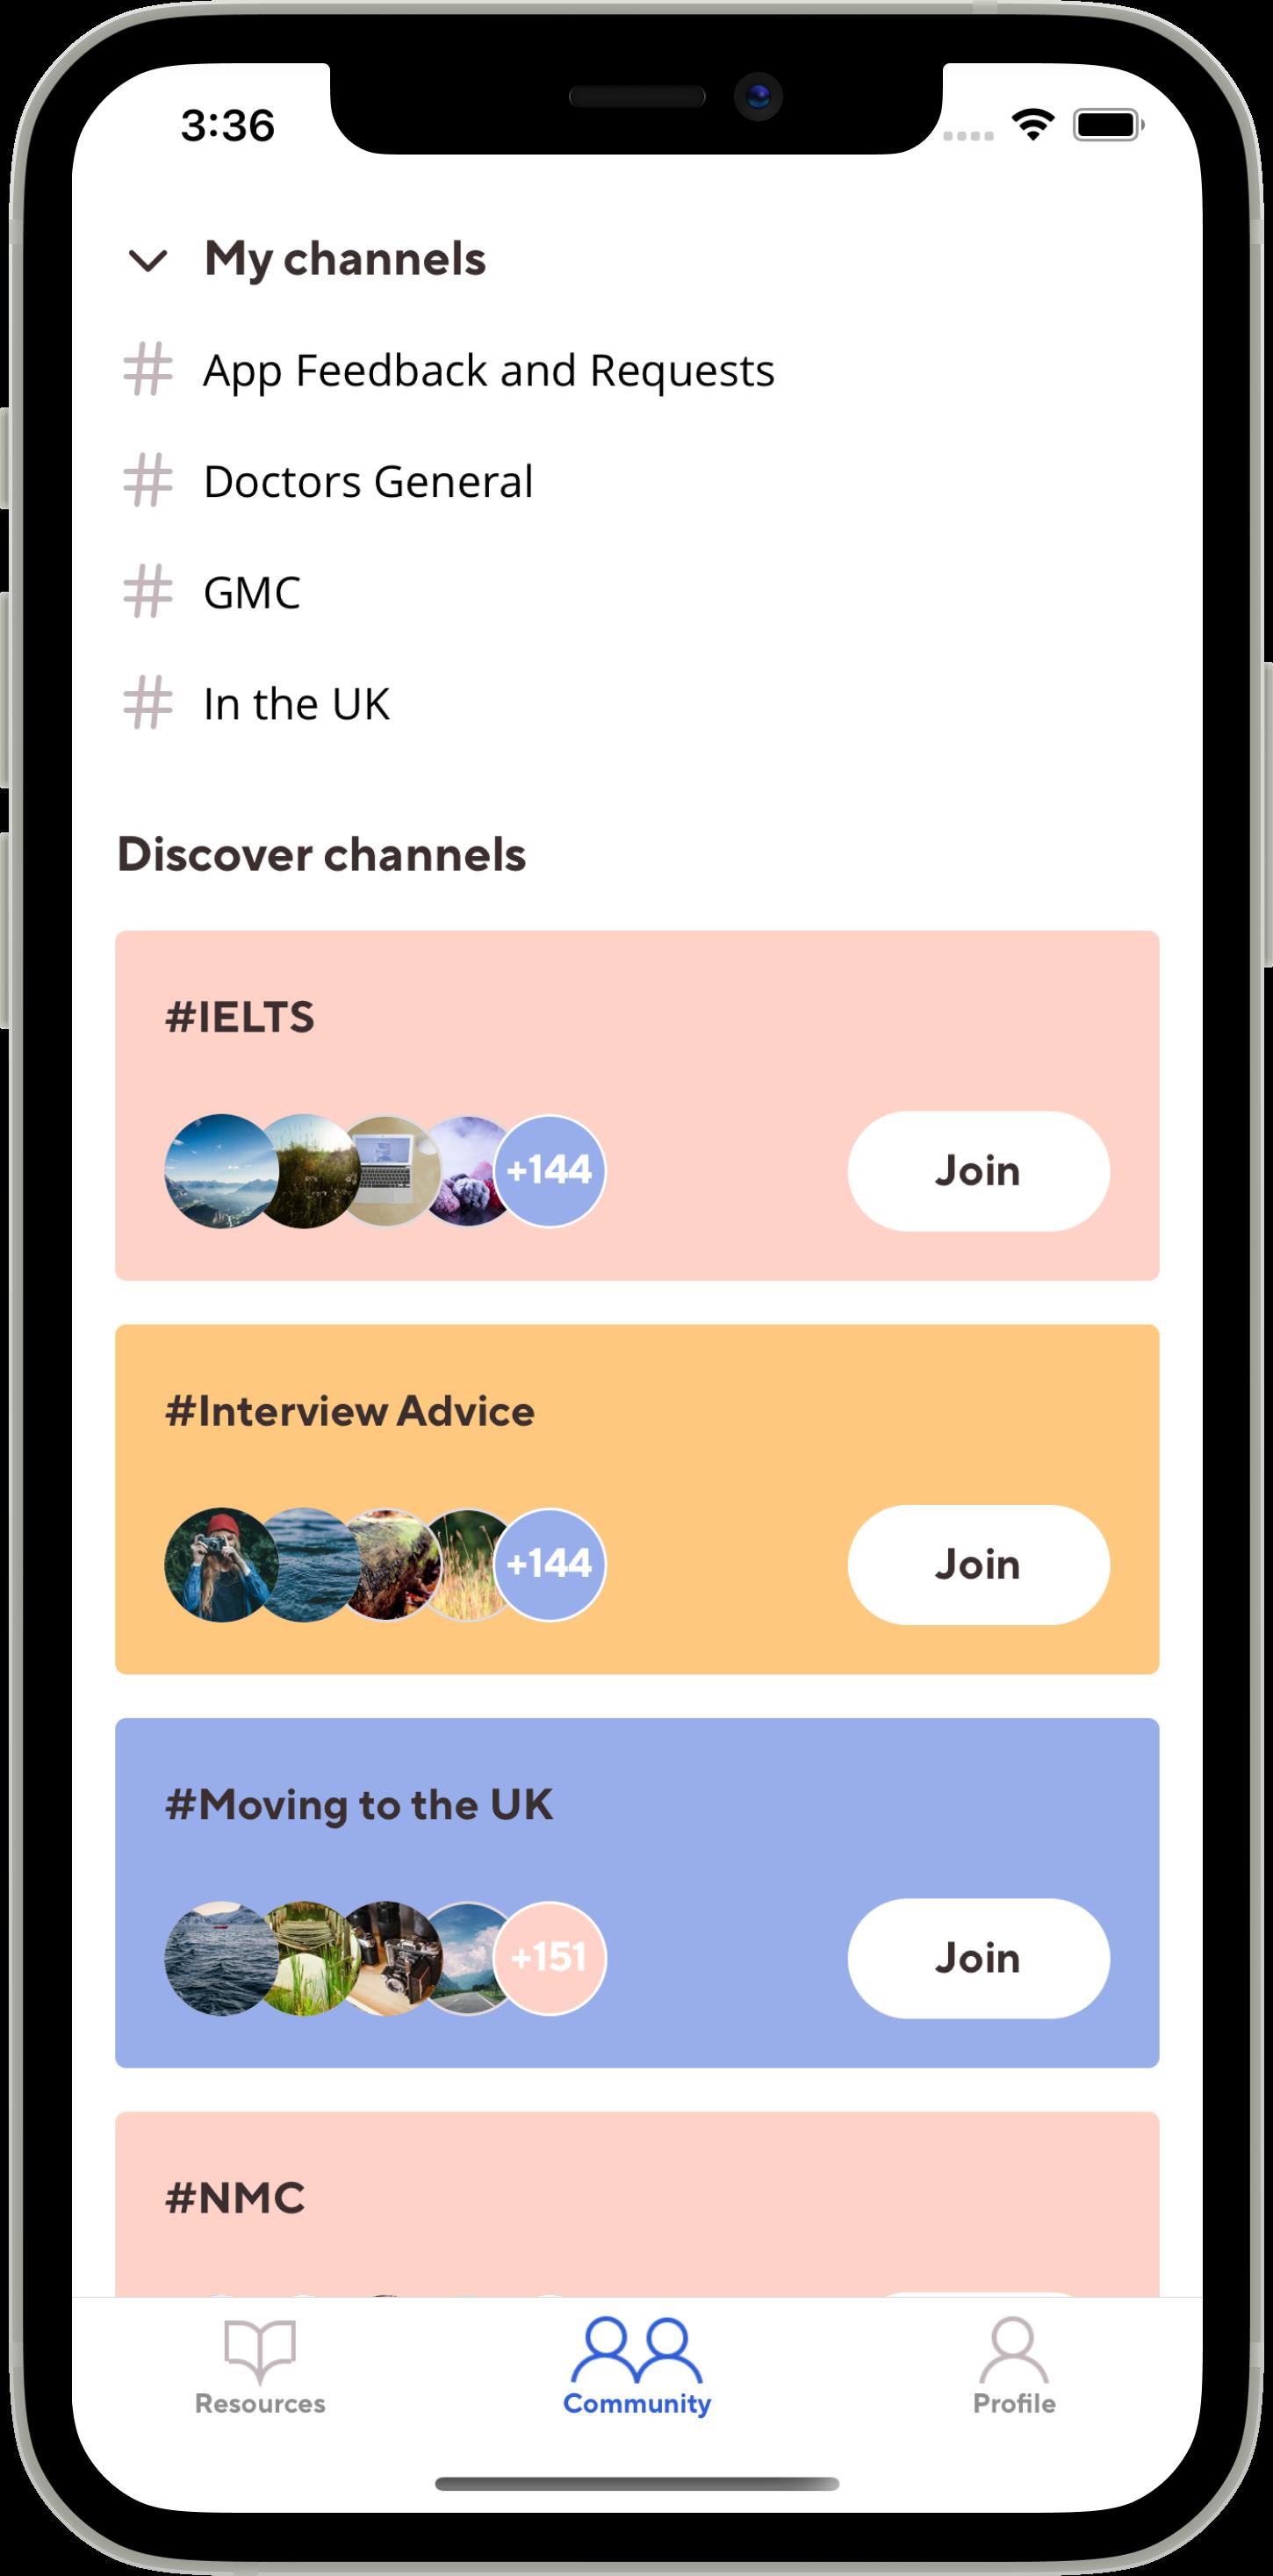 Migrate - The UK healthcare recruitment app